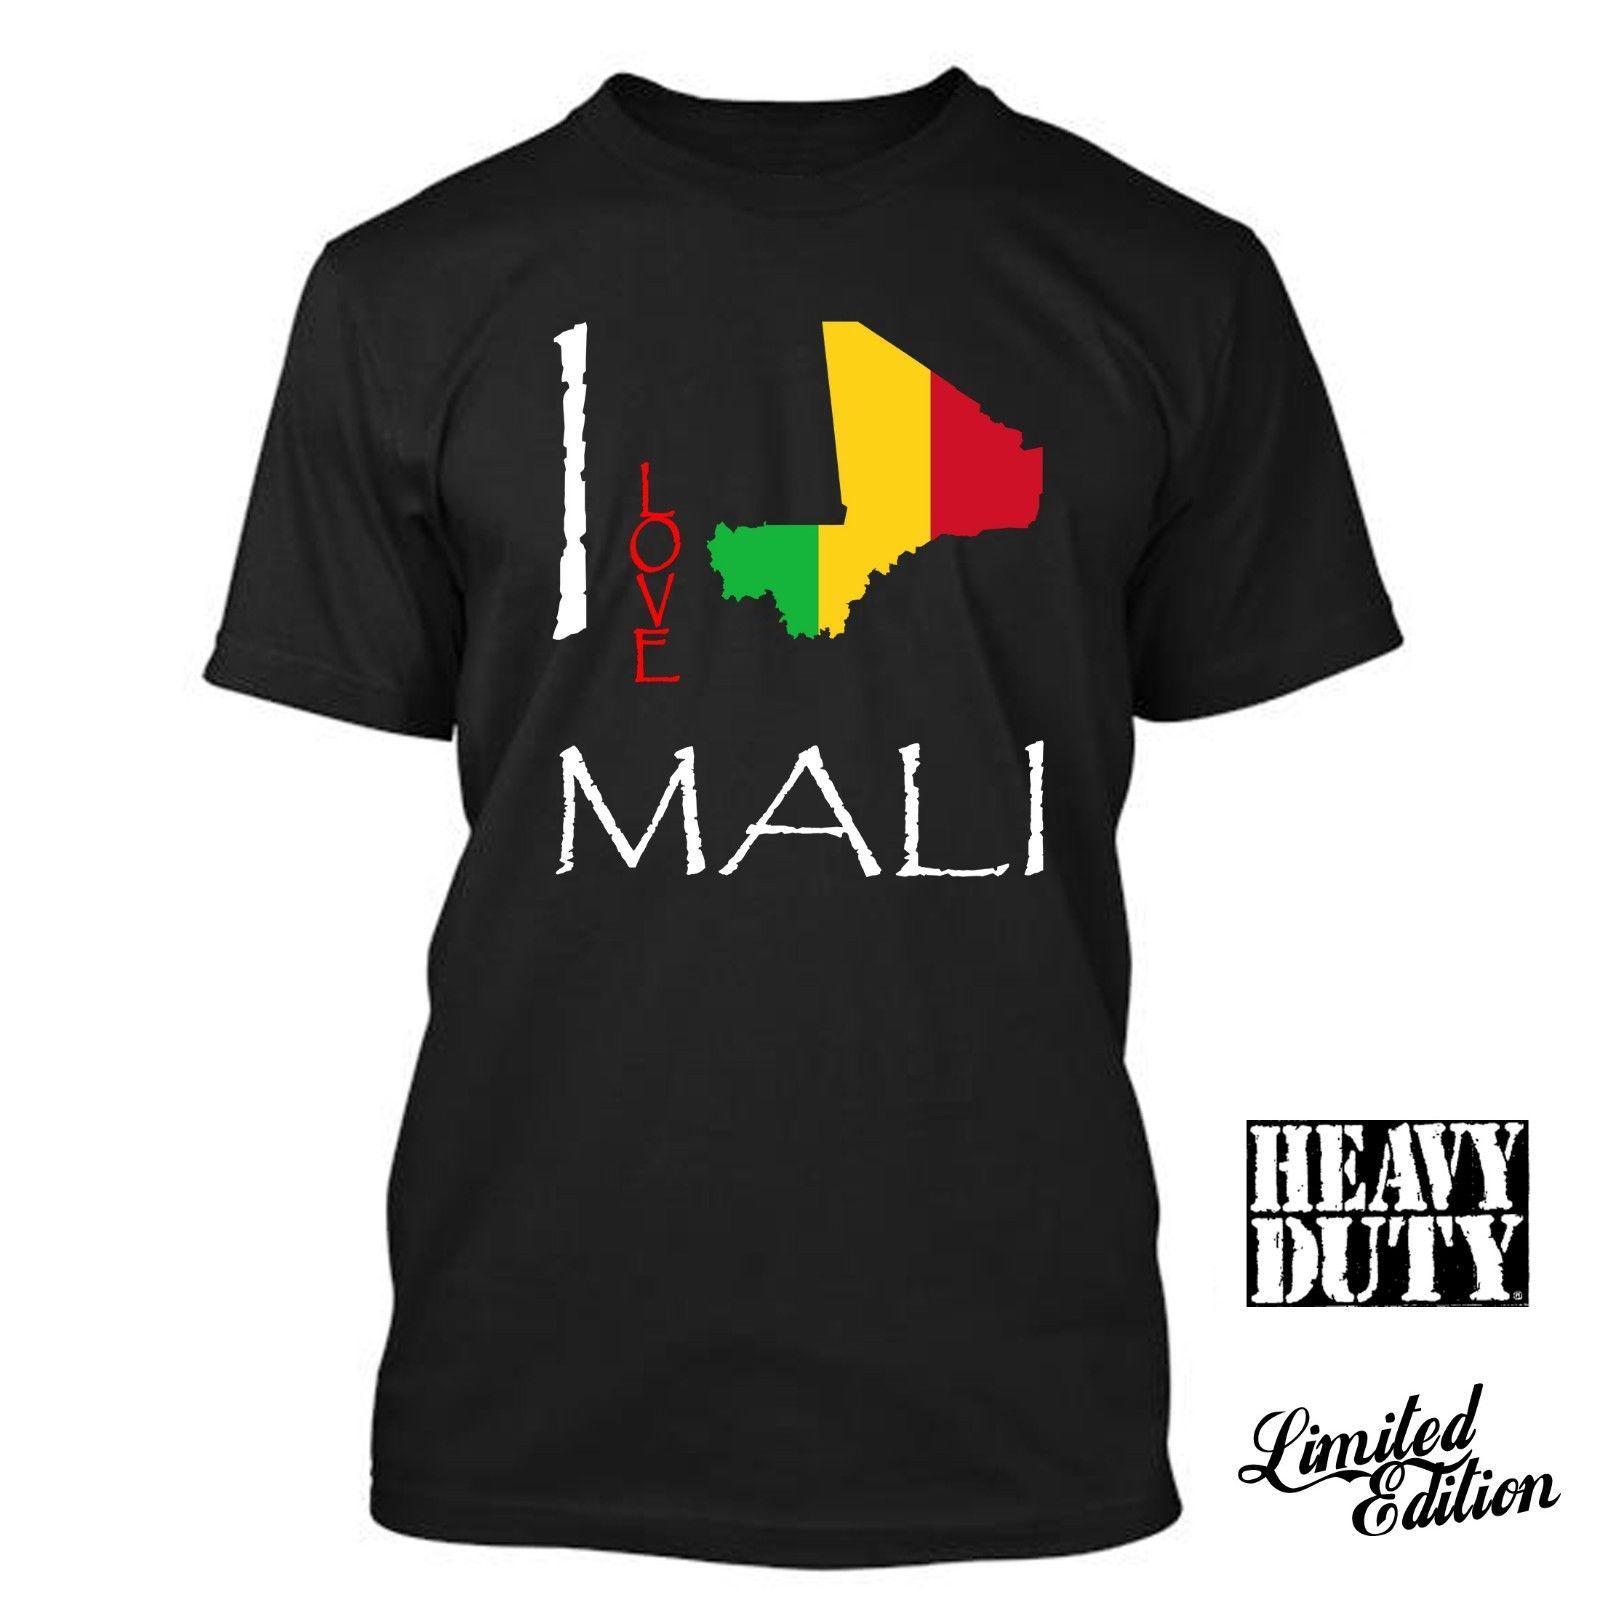 Print Tees Short Sleeve O-Neck MALI I Love Culture Flag T SHIRT TEES Men Summer Style